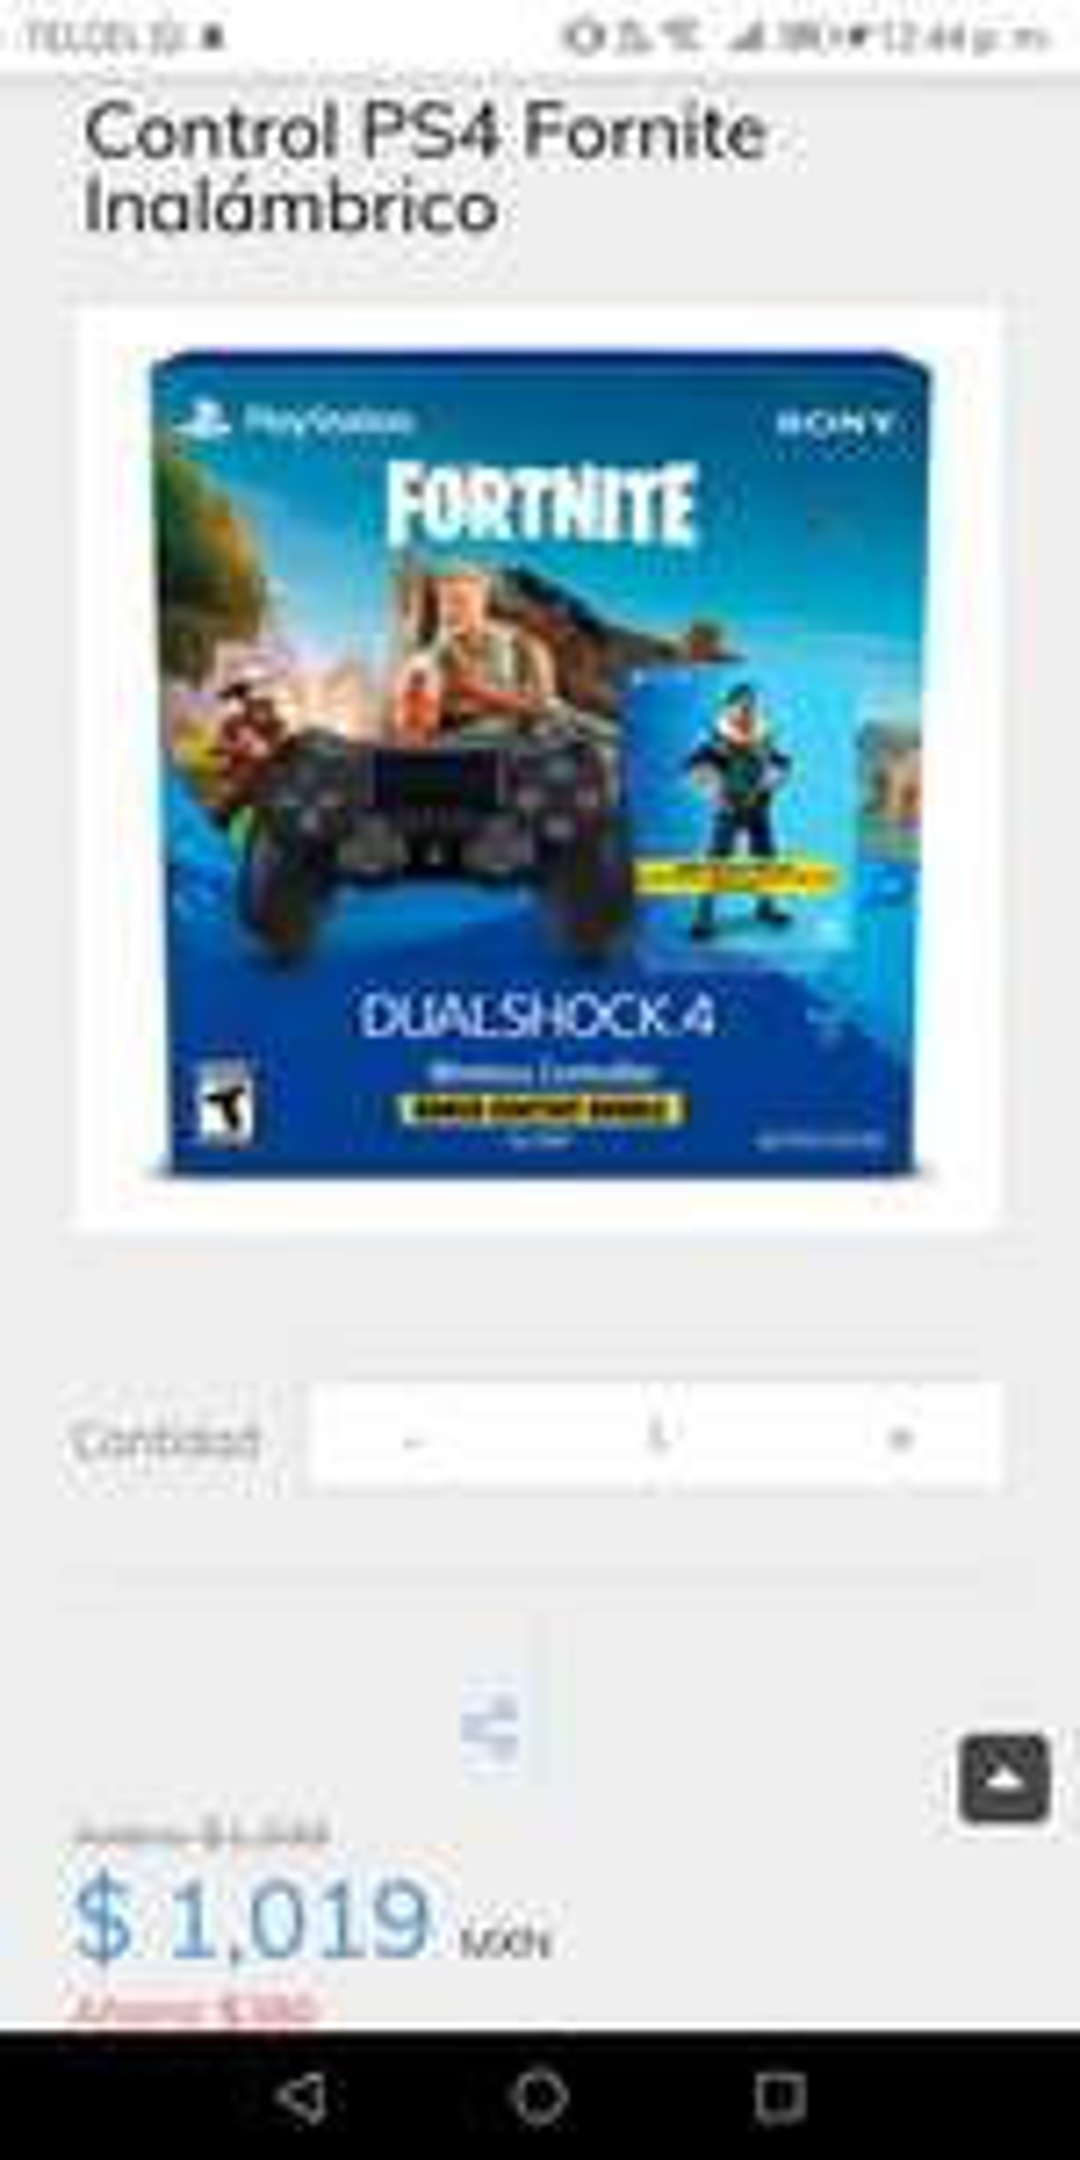 sanborns Control PS4 Fornite Inalámbrico